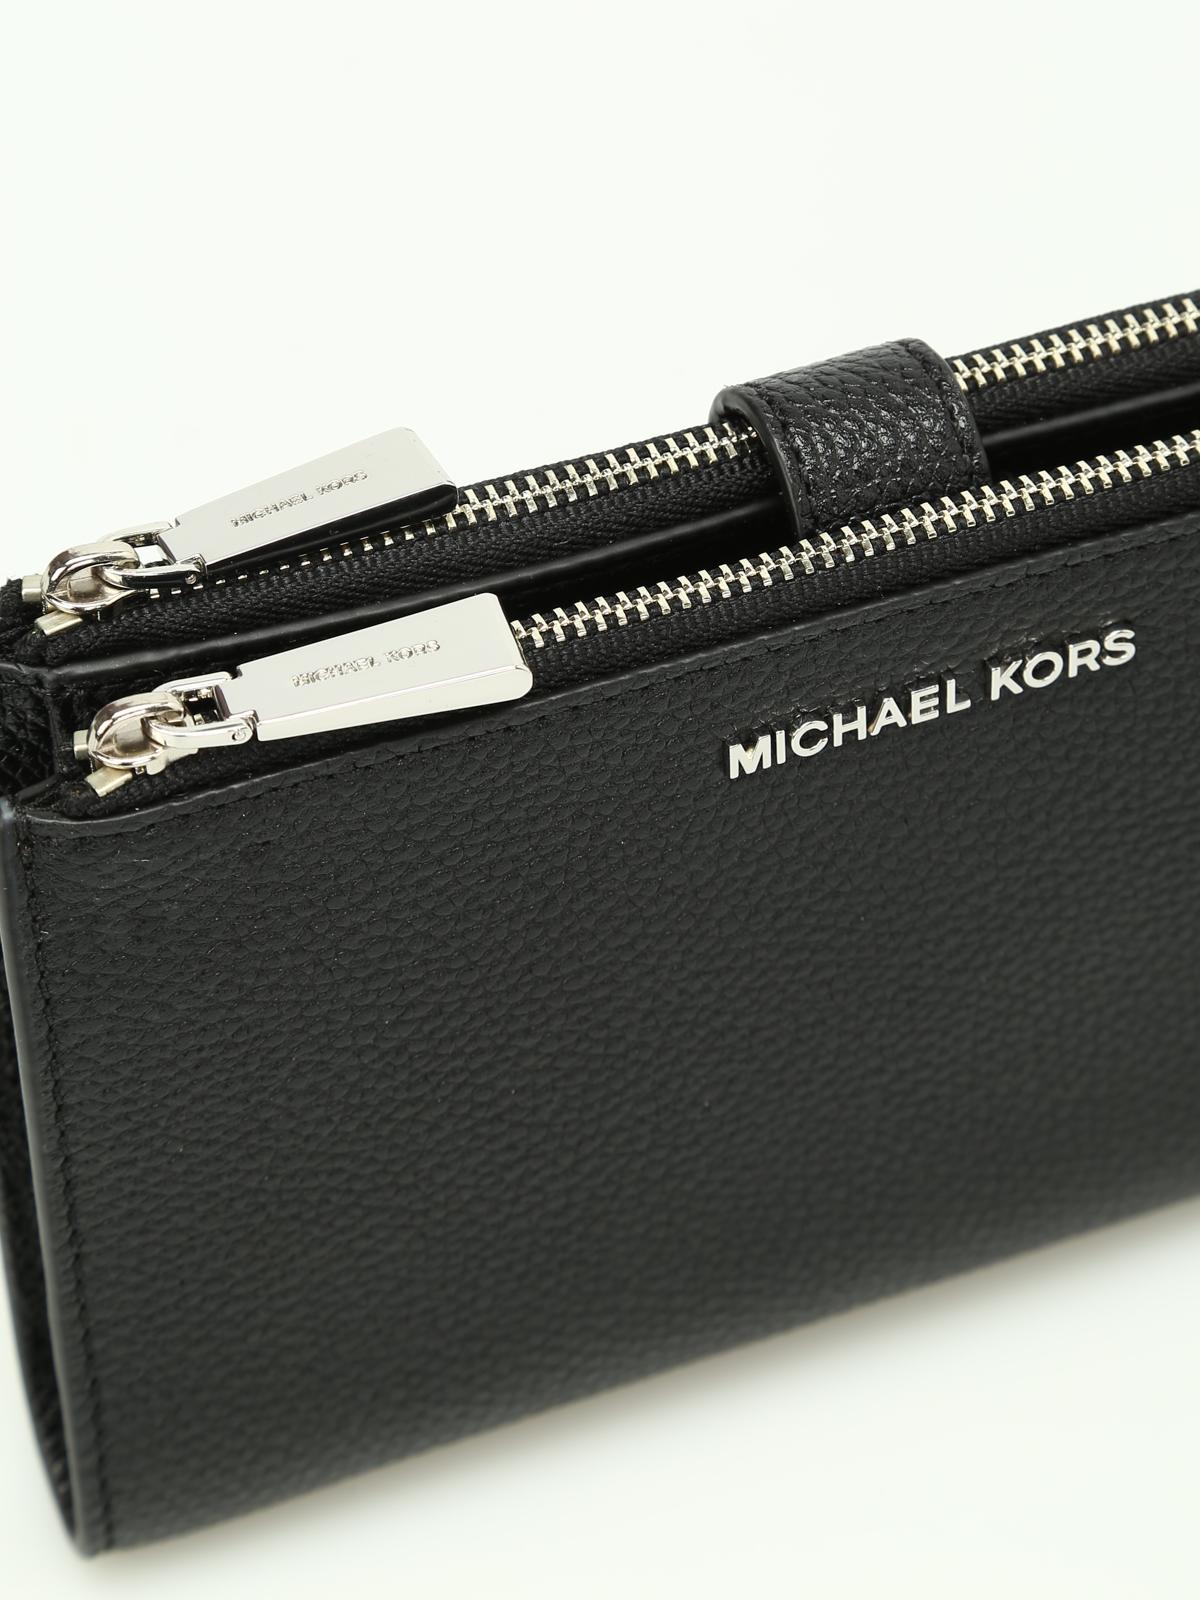 acquisto economico 095af 7a5ca Michael Kors - Portafoglio Adele nero - portafogli ...